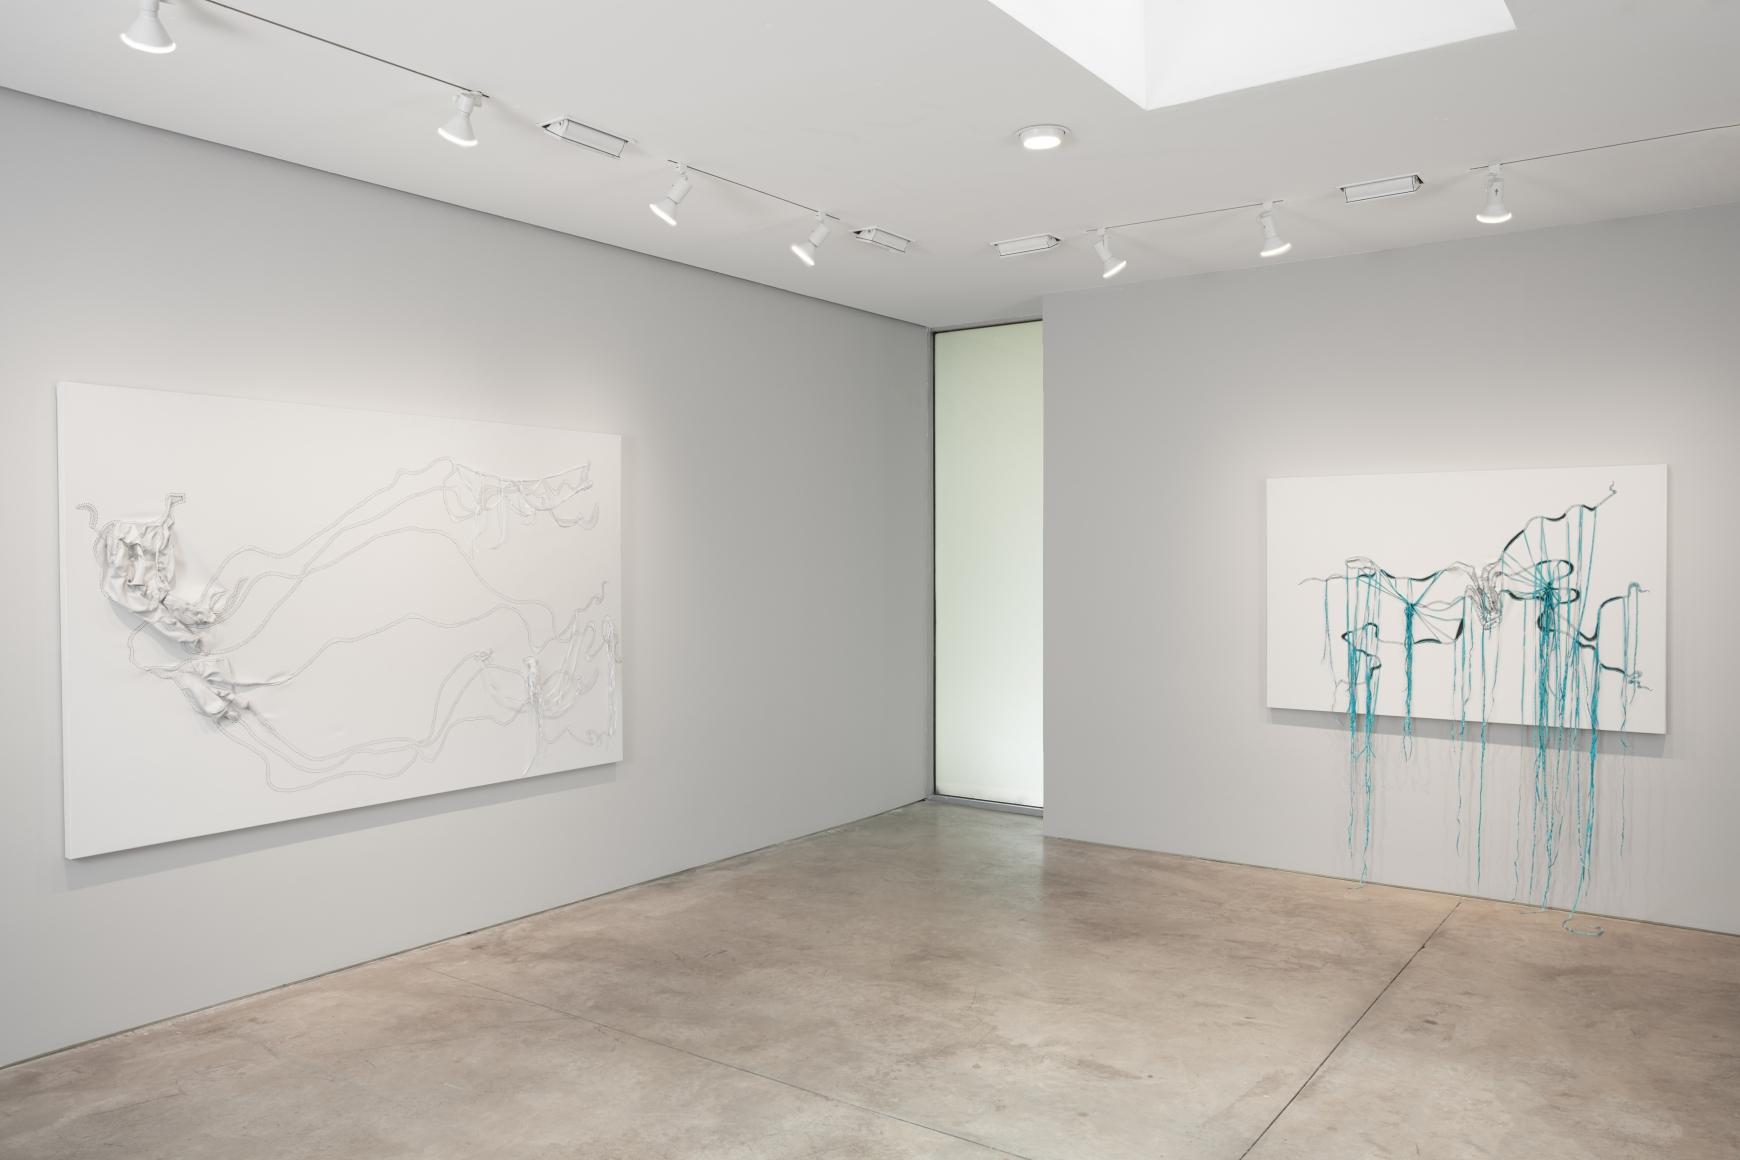 Nicholas Hlobo, Ulwamkelo installation view 7